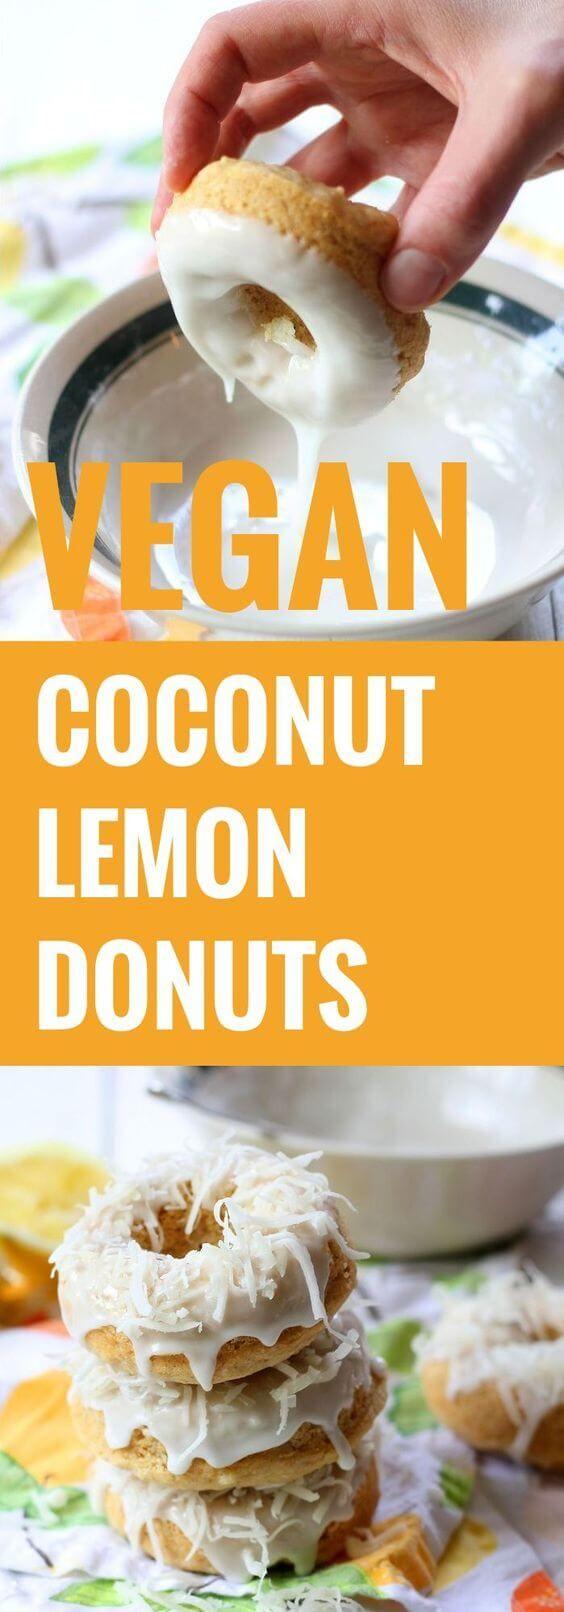 awesome Vegan Lemon Coconut Donuts